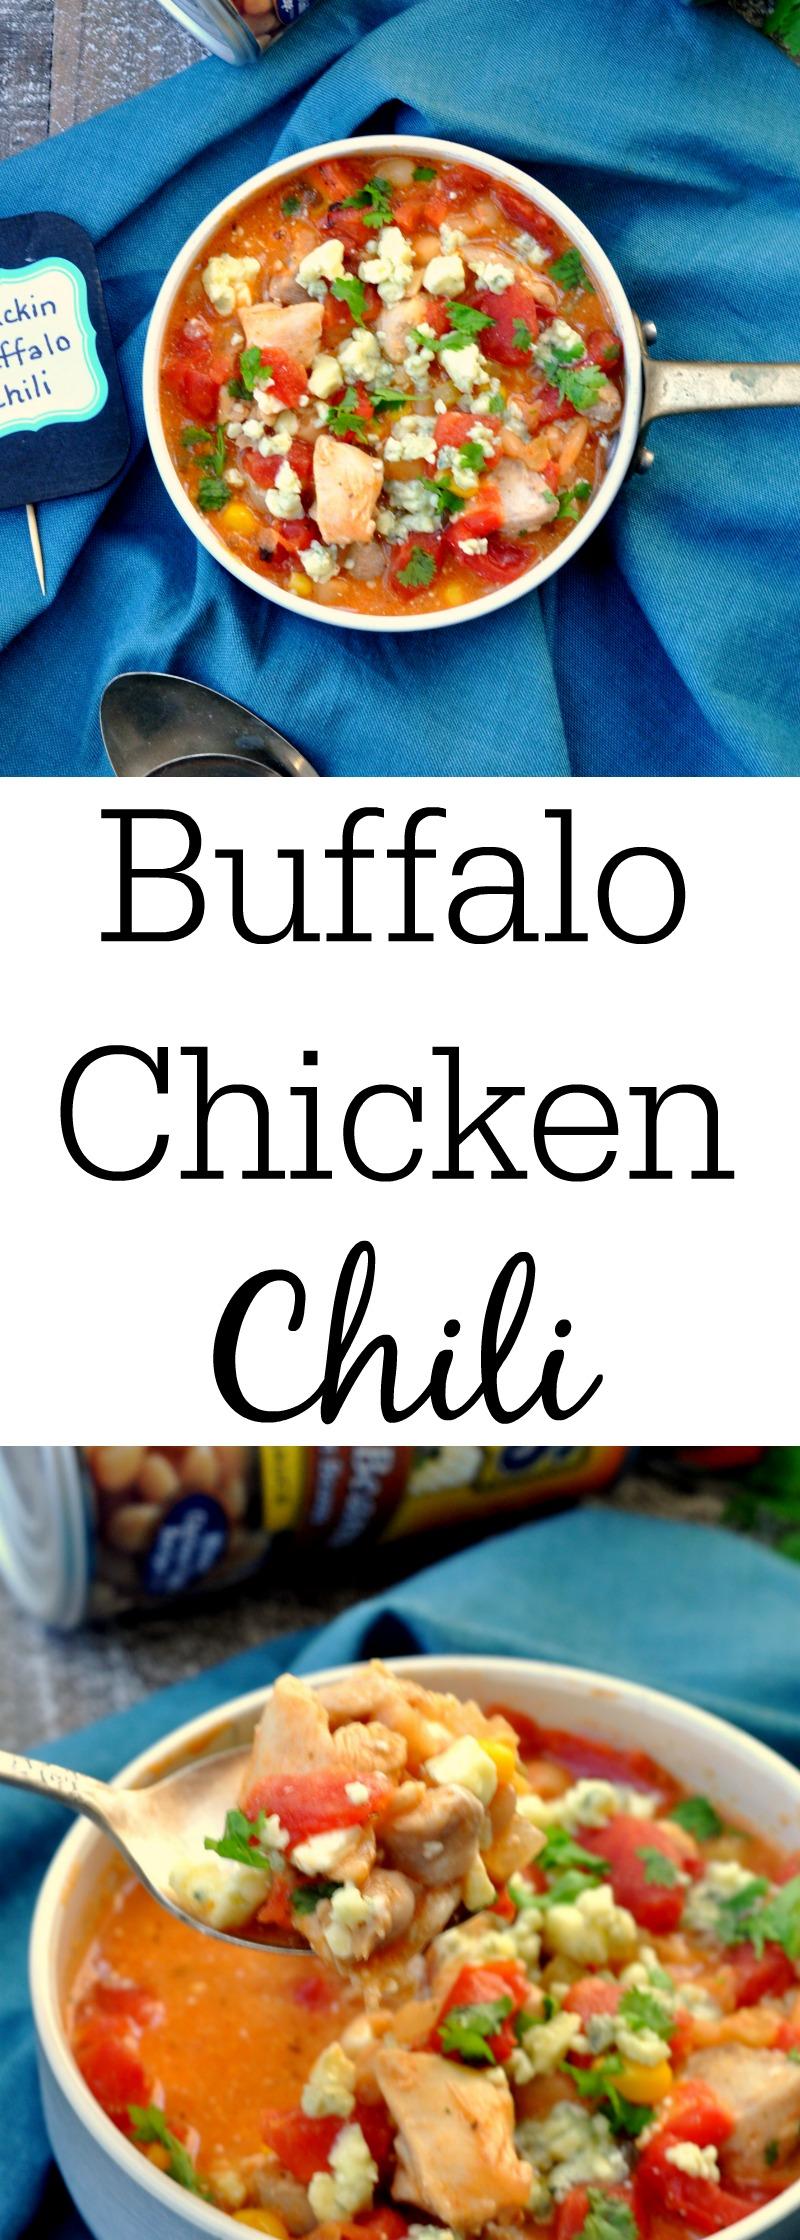 Buffalo Chicken Chili - My Suburban Kitchen